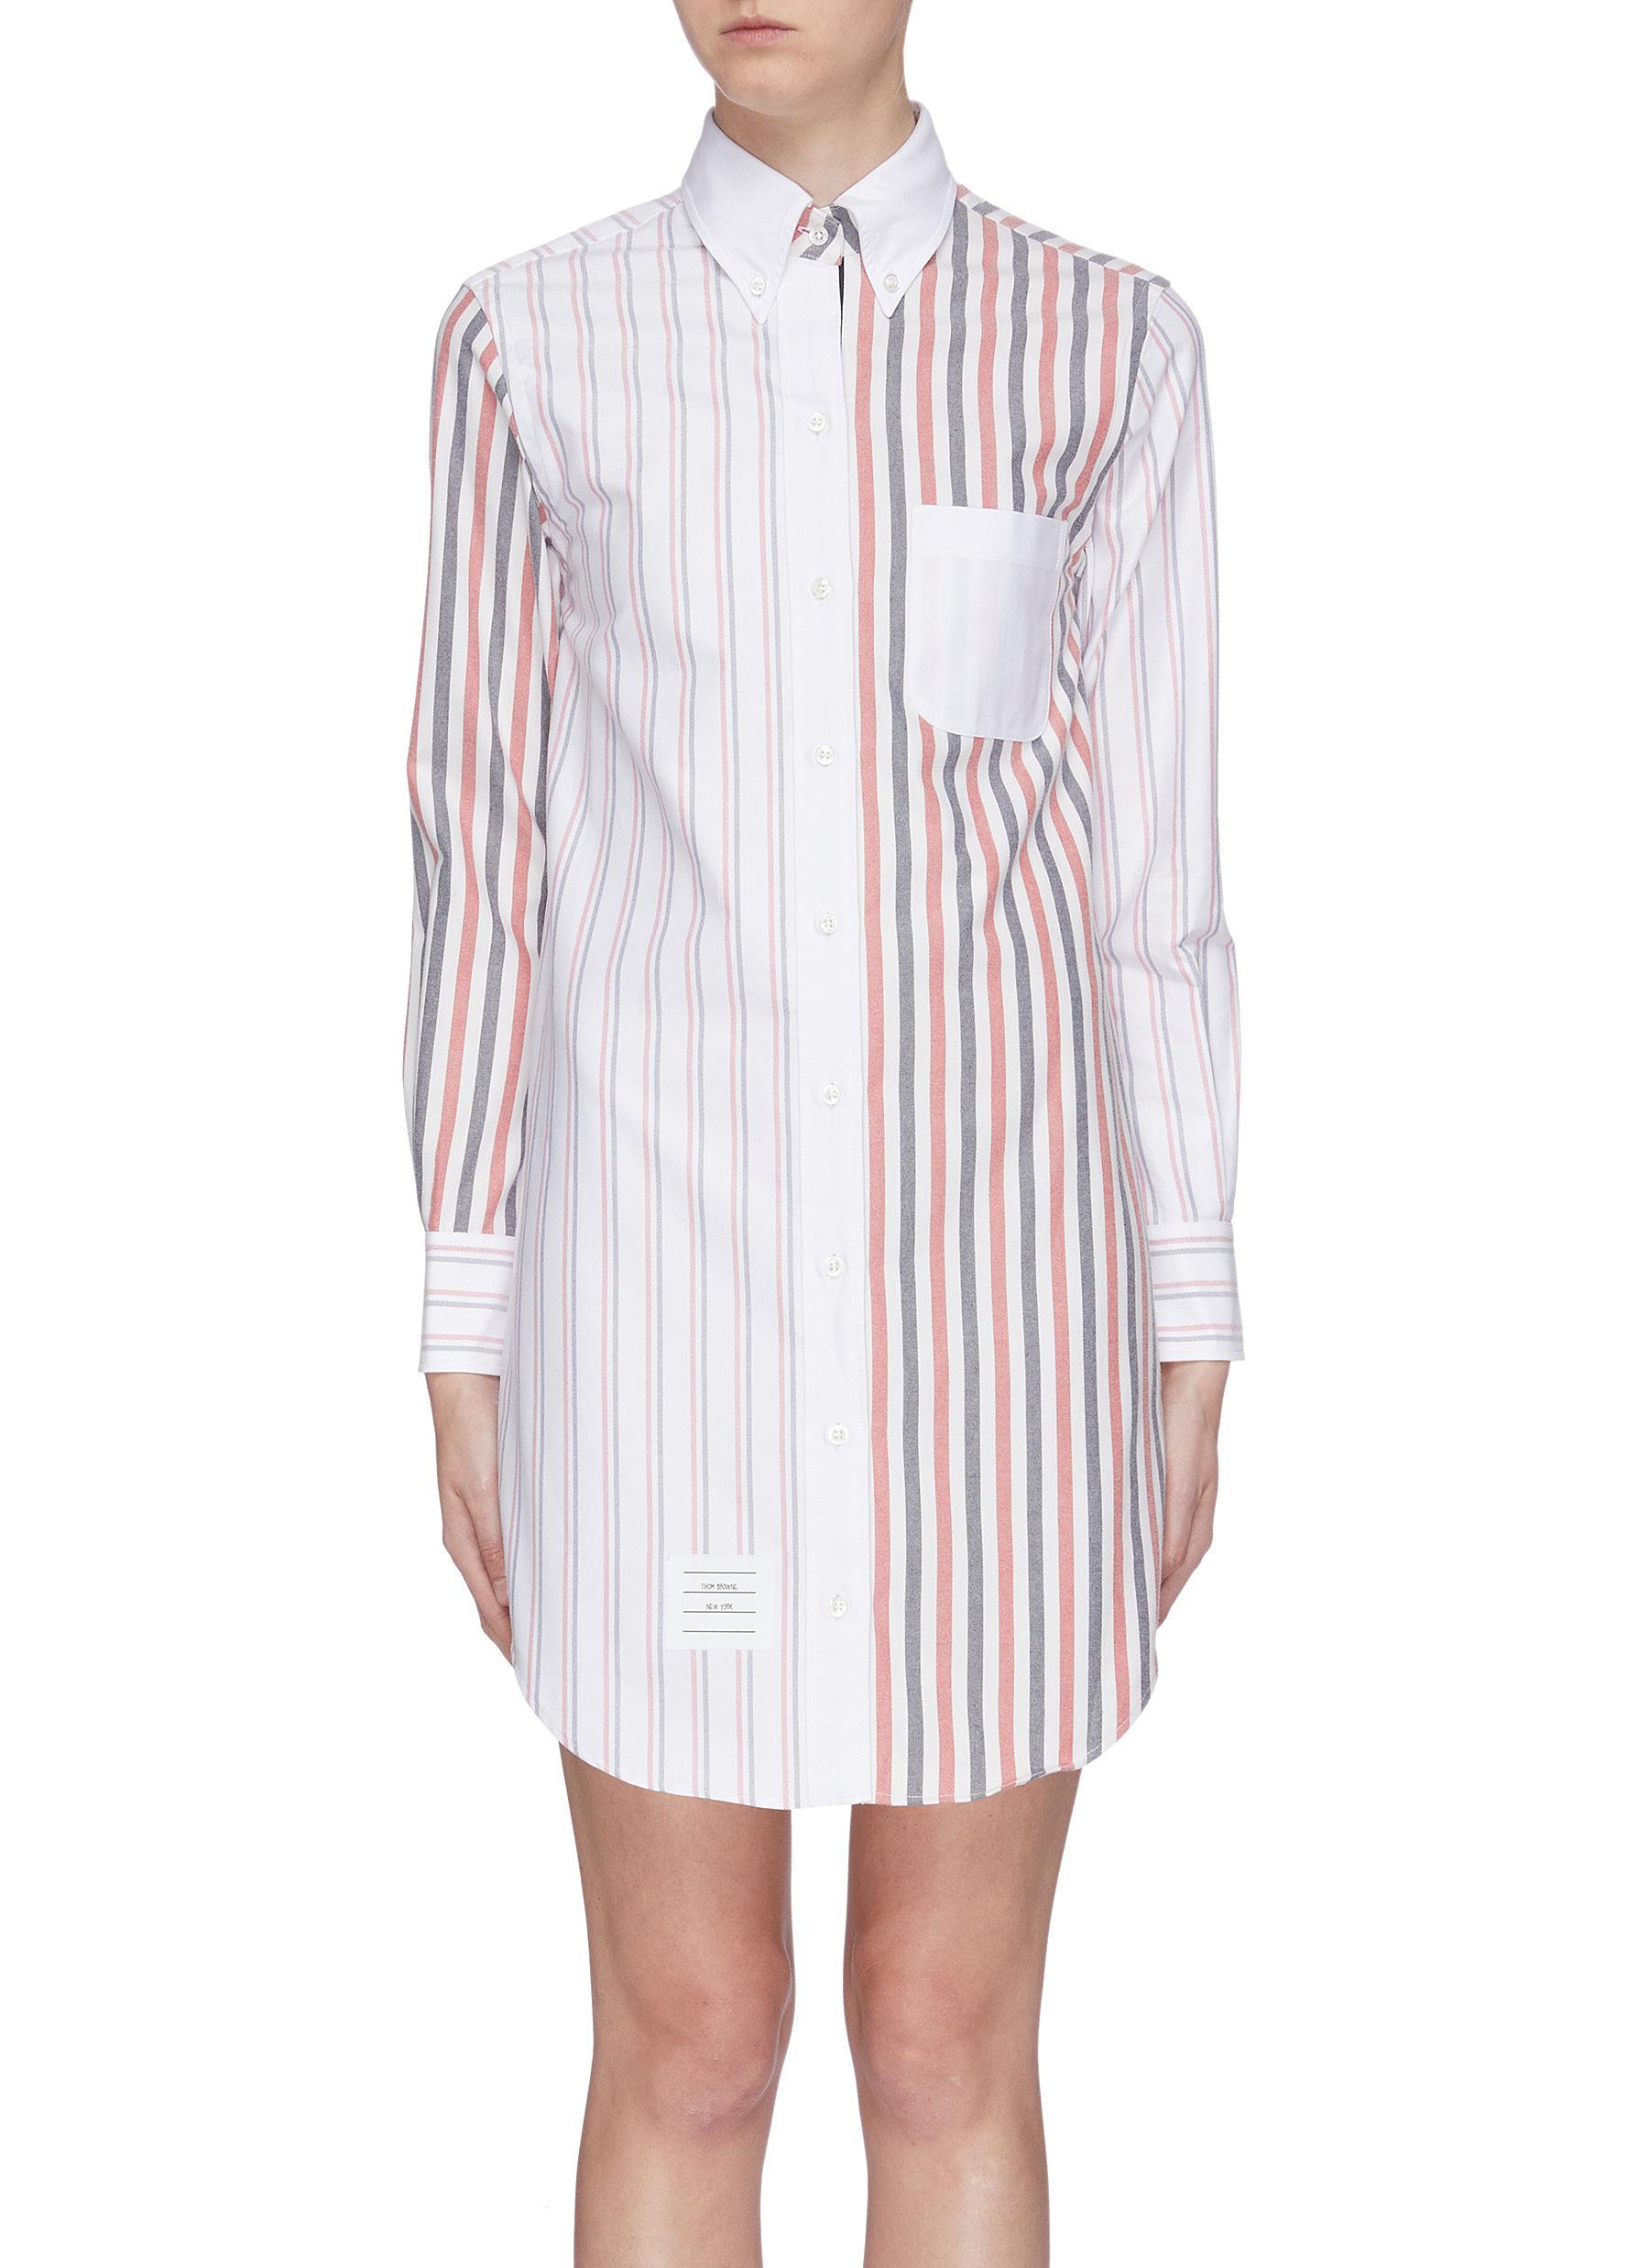 Stripe panel shirt dress by Thom Browne